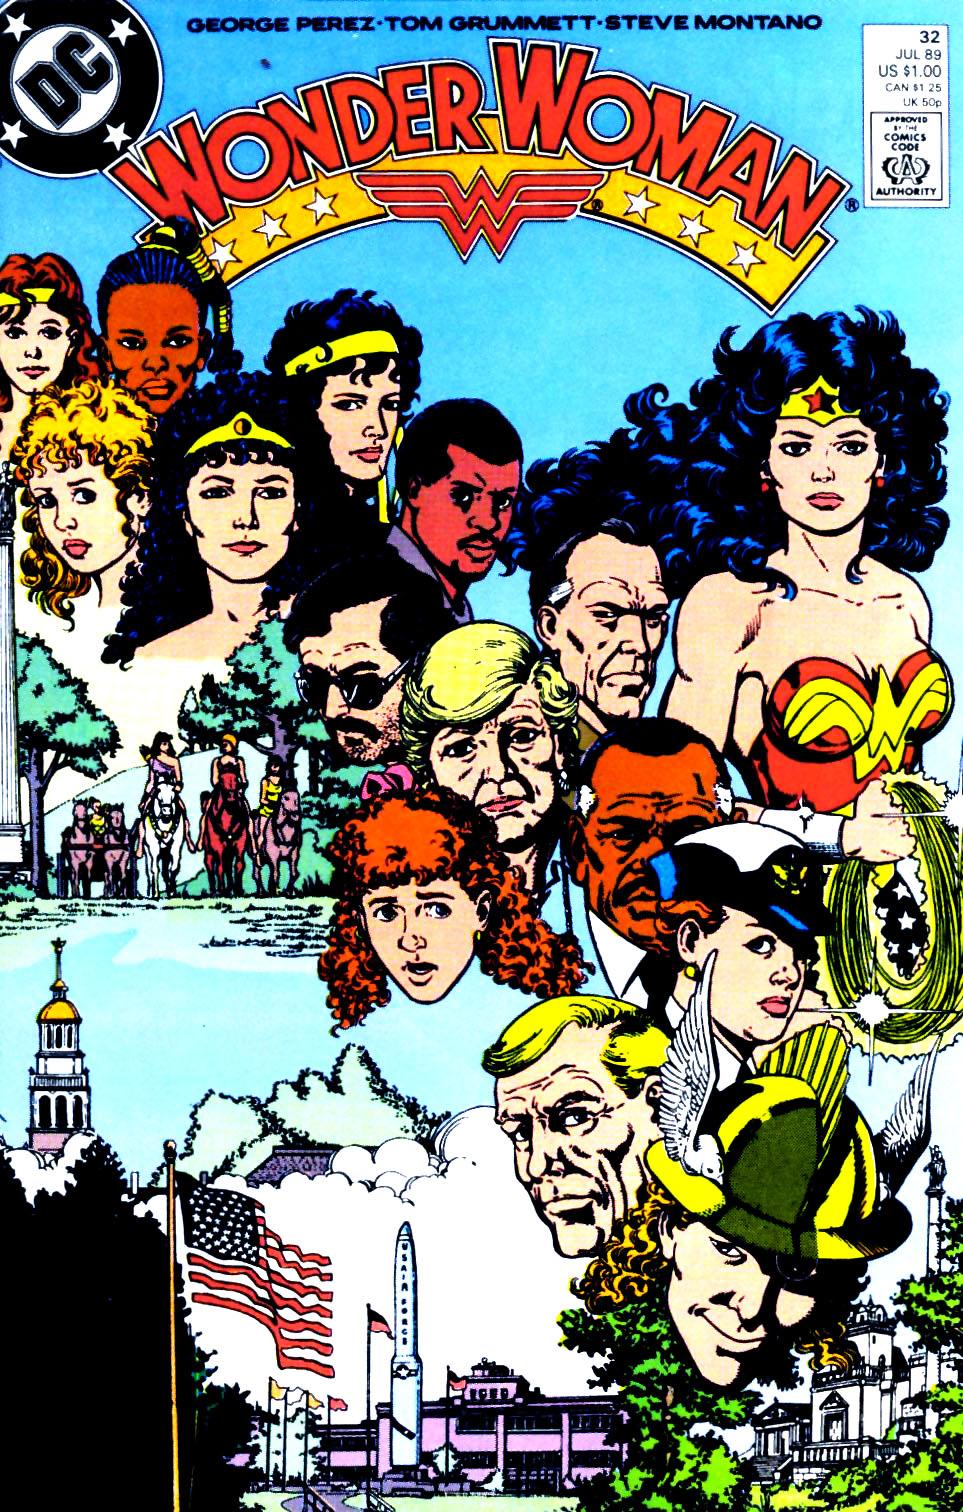 Read online Wonder Woman (1987) comic -  Issue #32 - 1